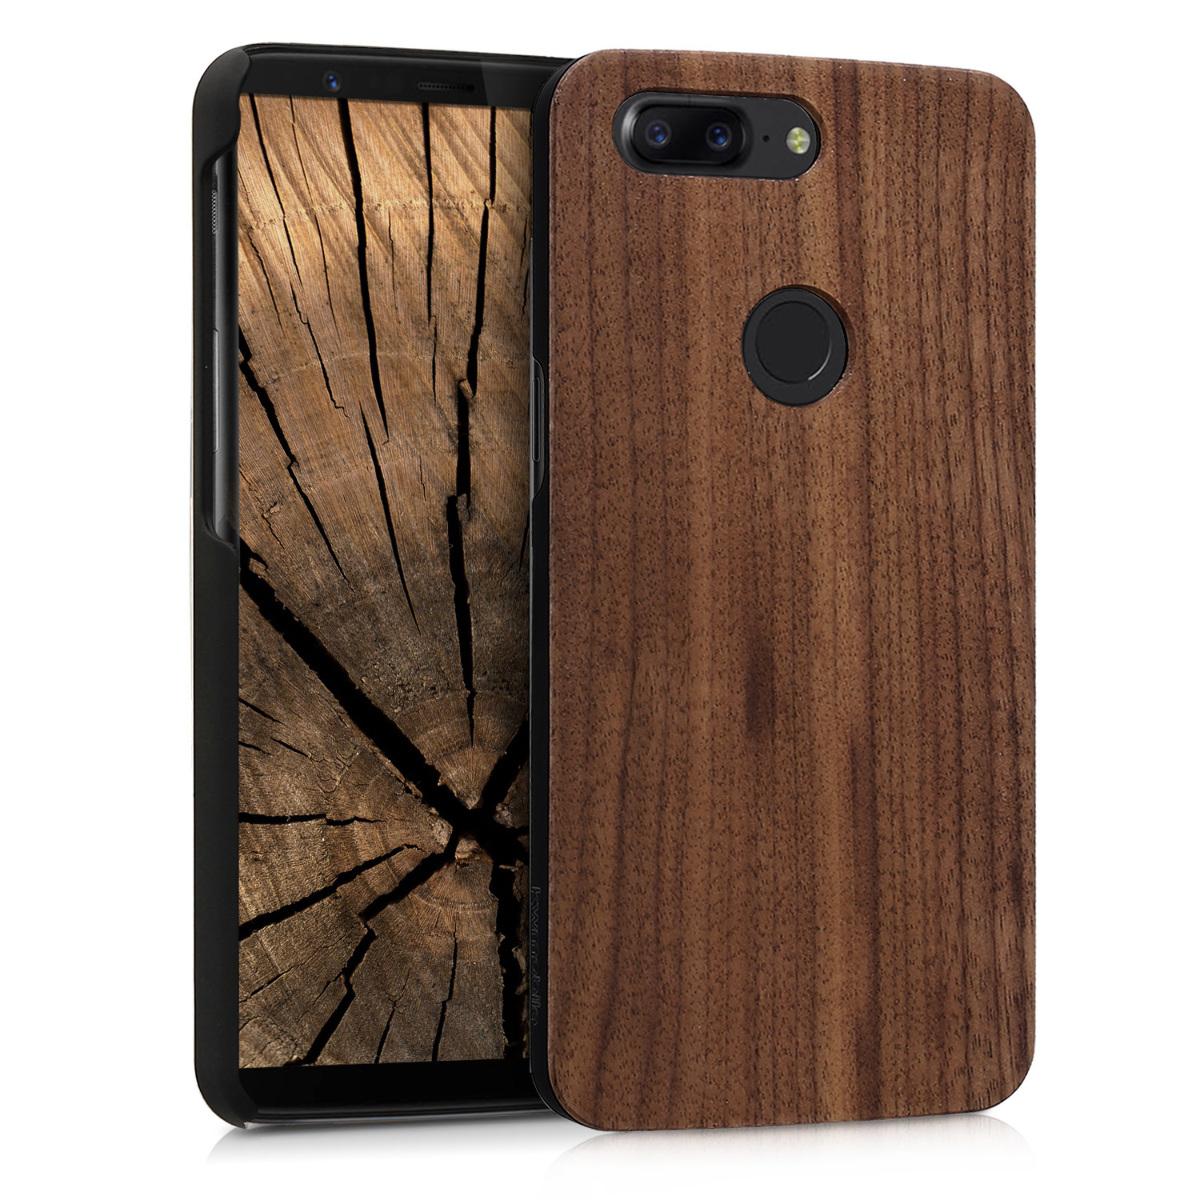 KW Ξύλινη Θήκη OnePlus 5T - Brown (43816.18)